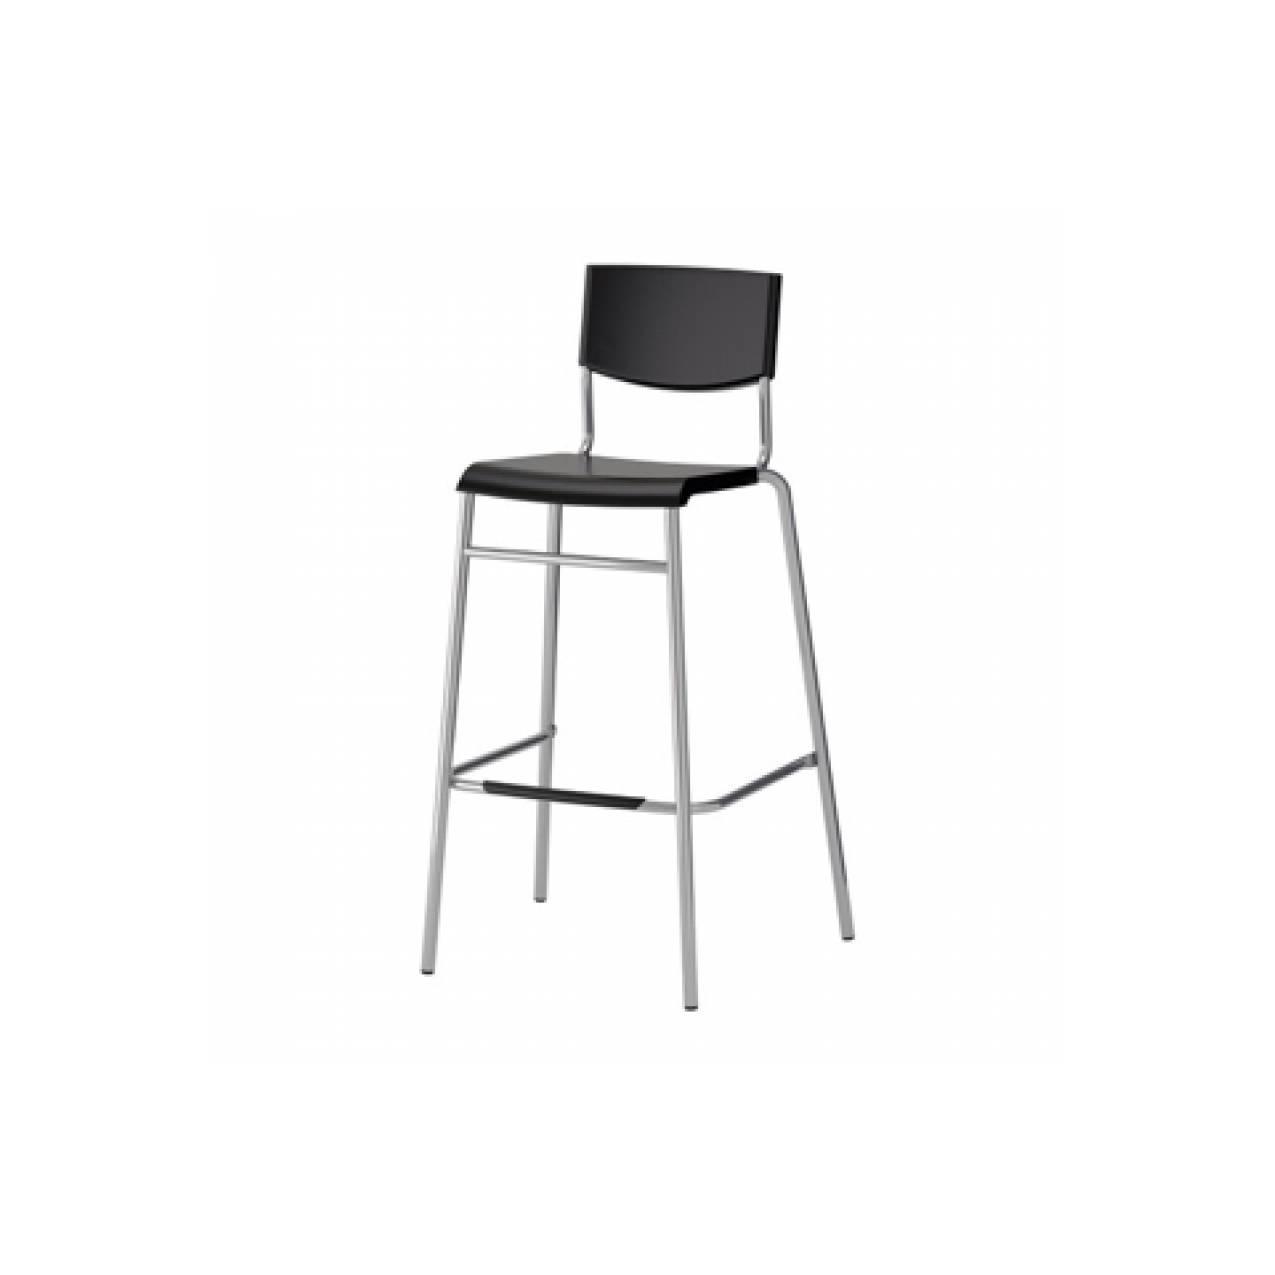 IKEA STIG Kursi Bar dengan Sandaran - Hitam, tinggi 74 cm